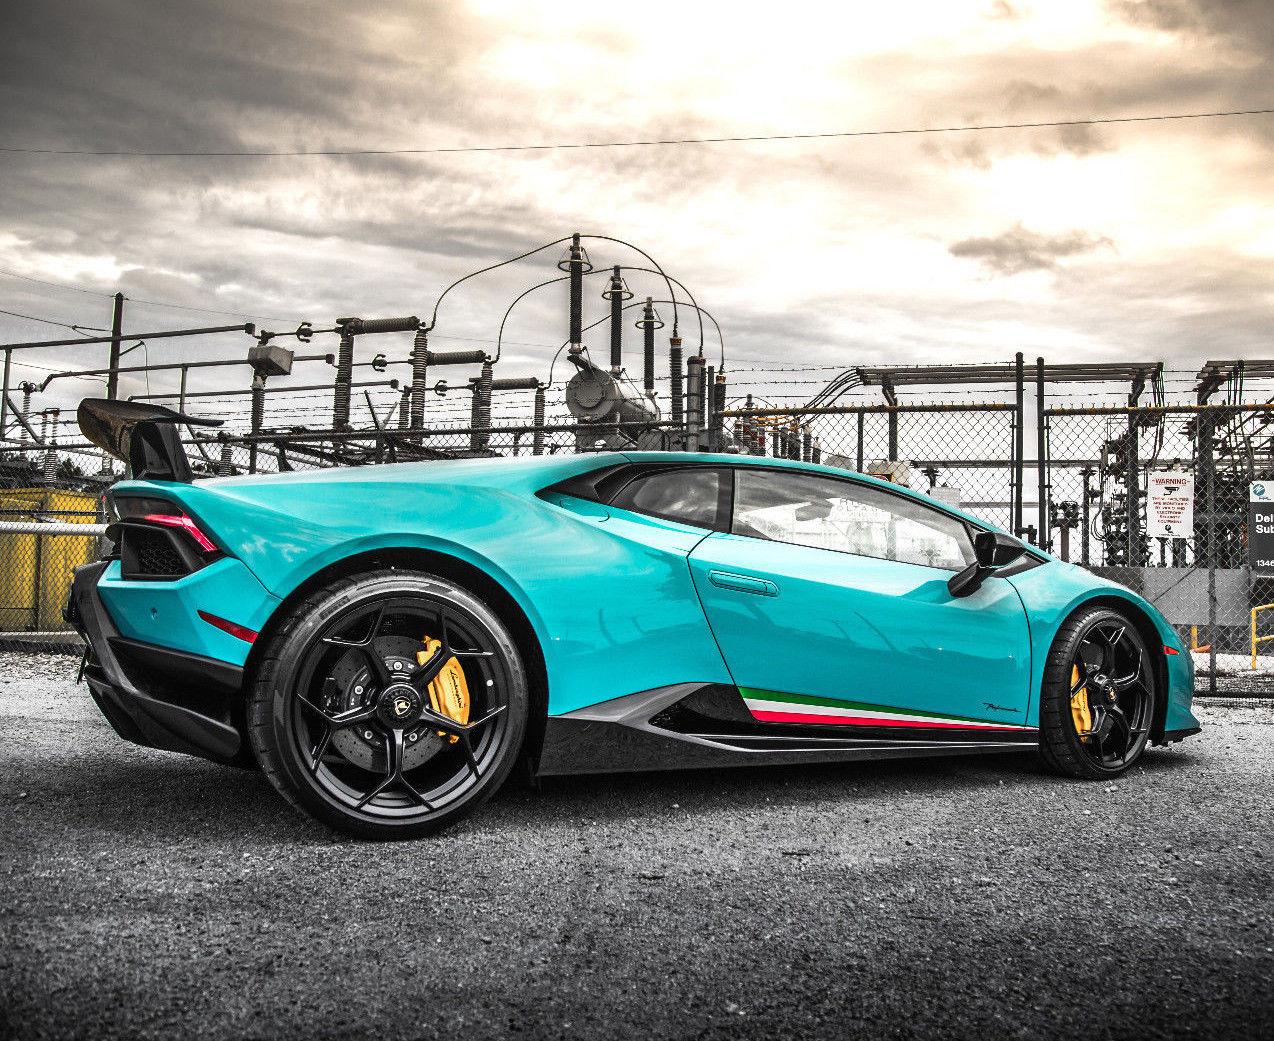 Awesome 2018 Lamborghini Huracan 2018 Lamborghini Huracan